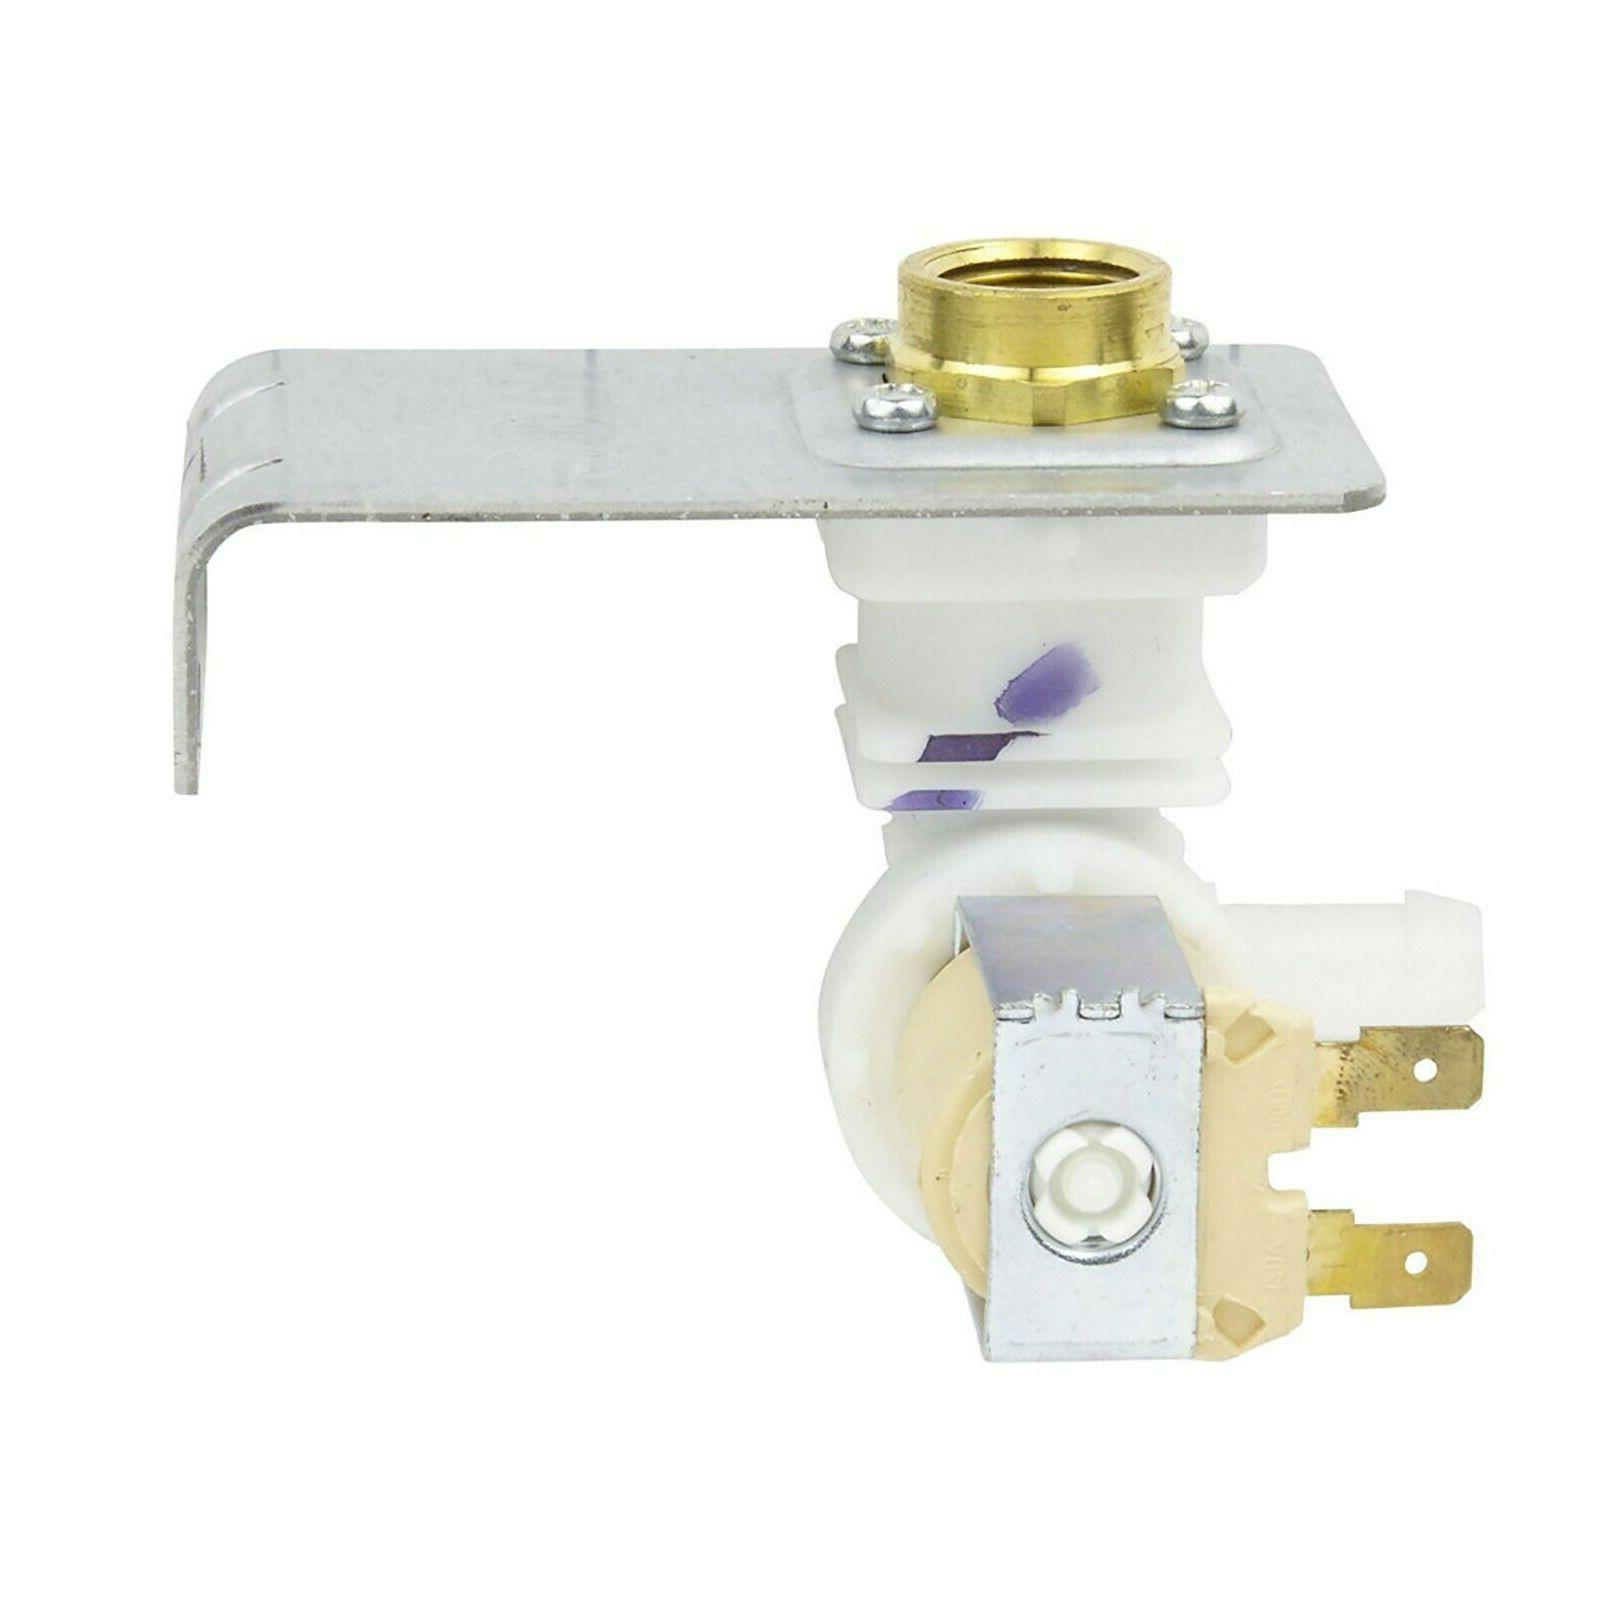 replacement 154637401 dishwasher water inlet valve